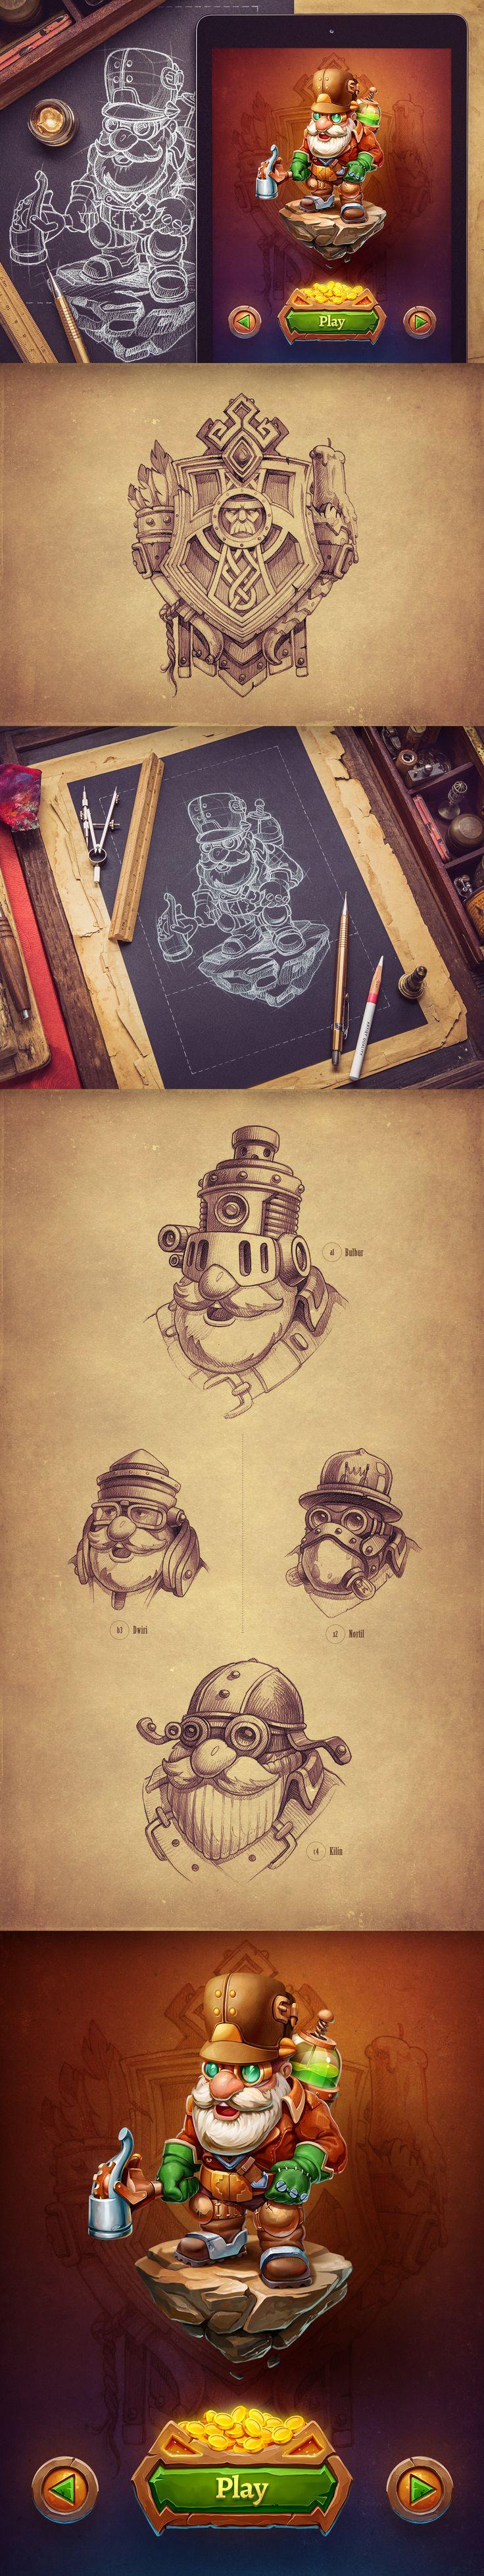 Ios rpg character design